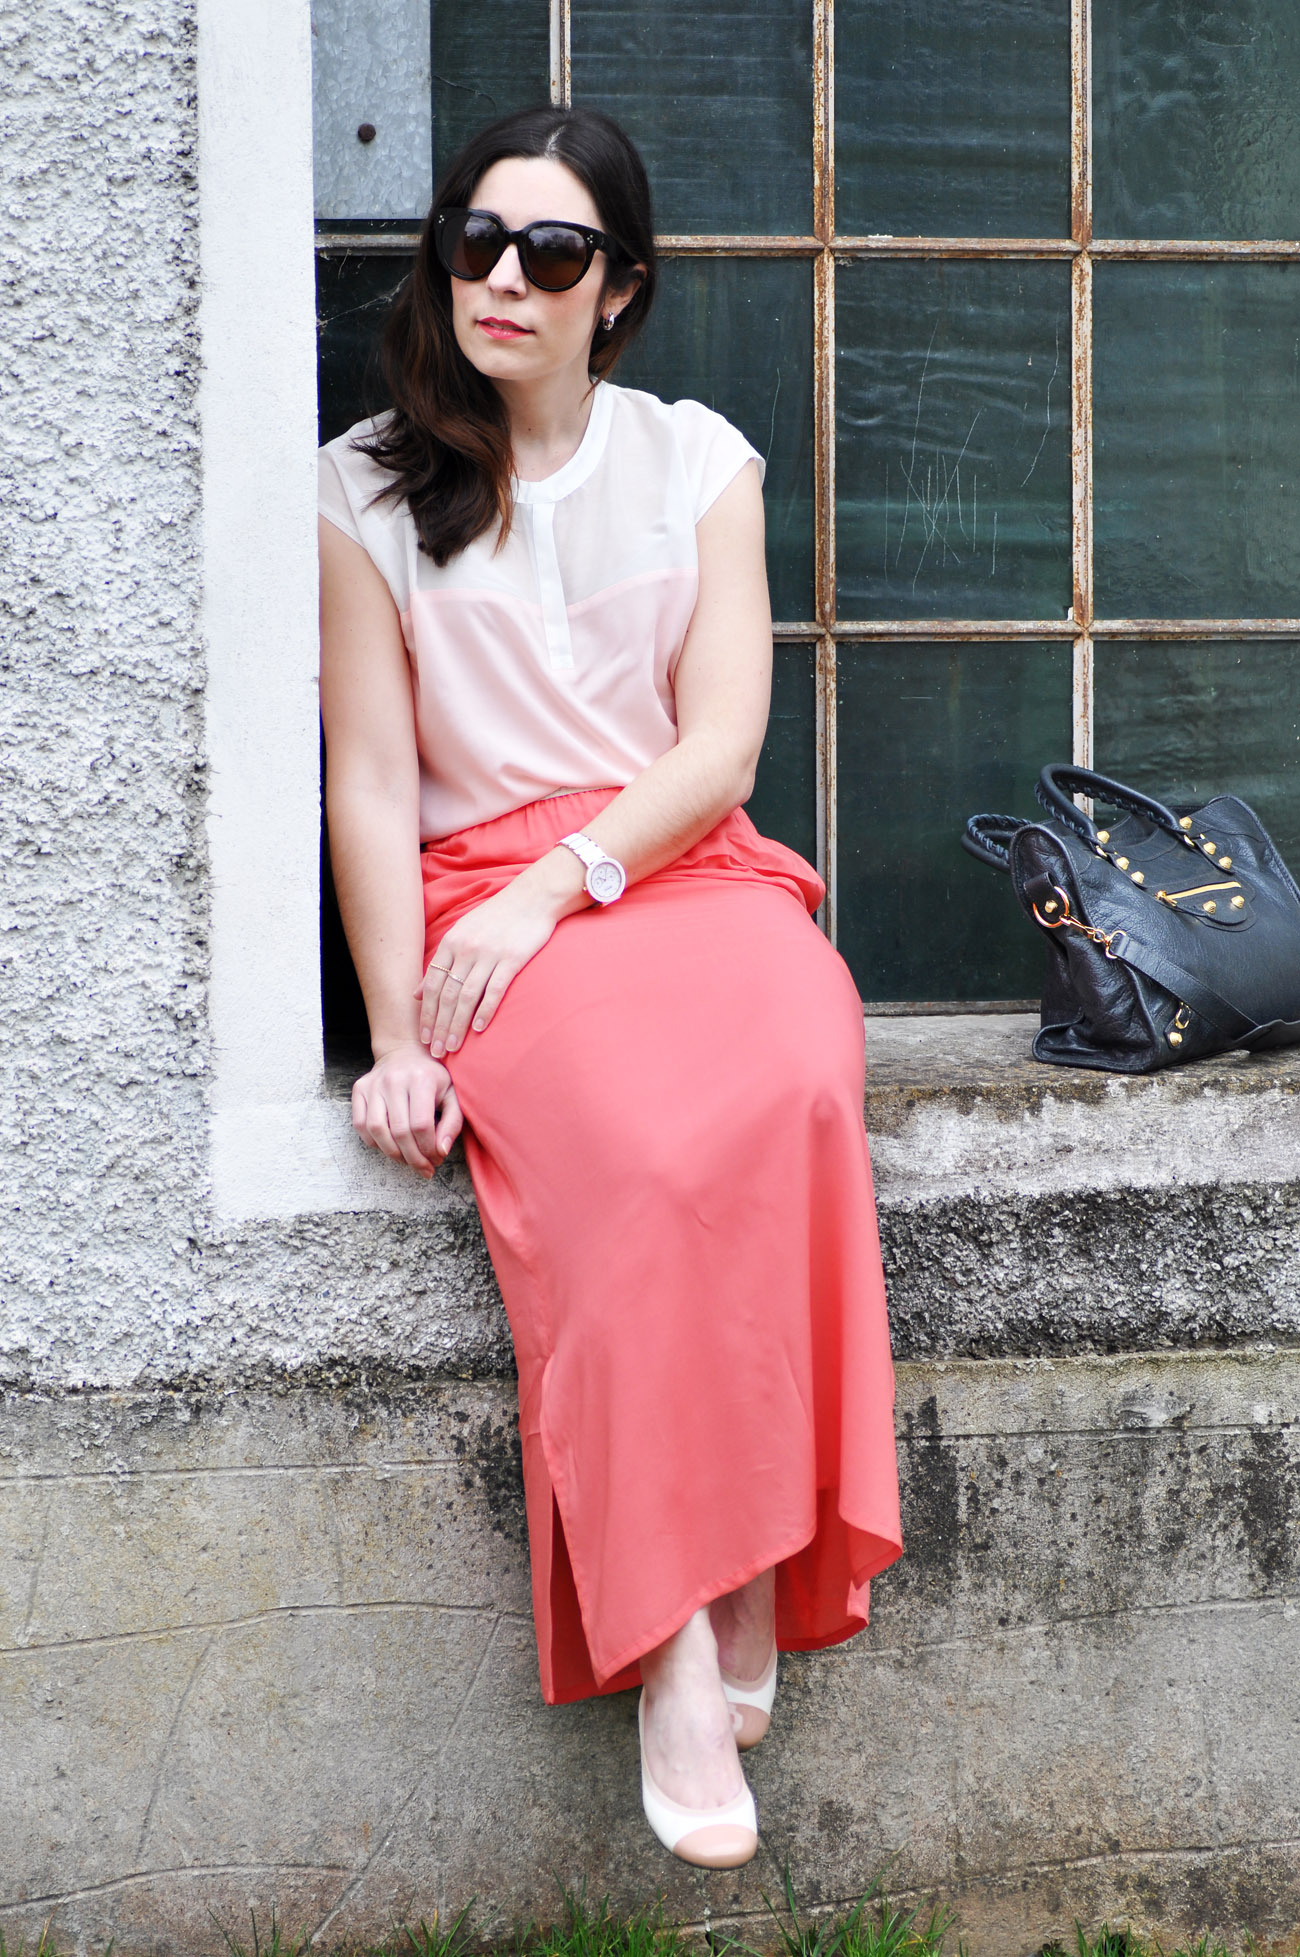 Graz Fashionblog Outfit Me May 1